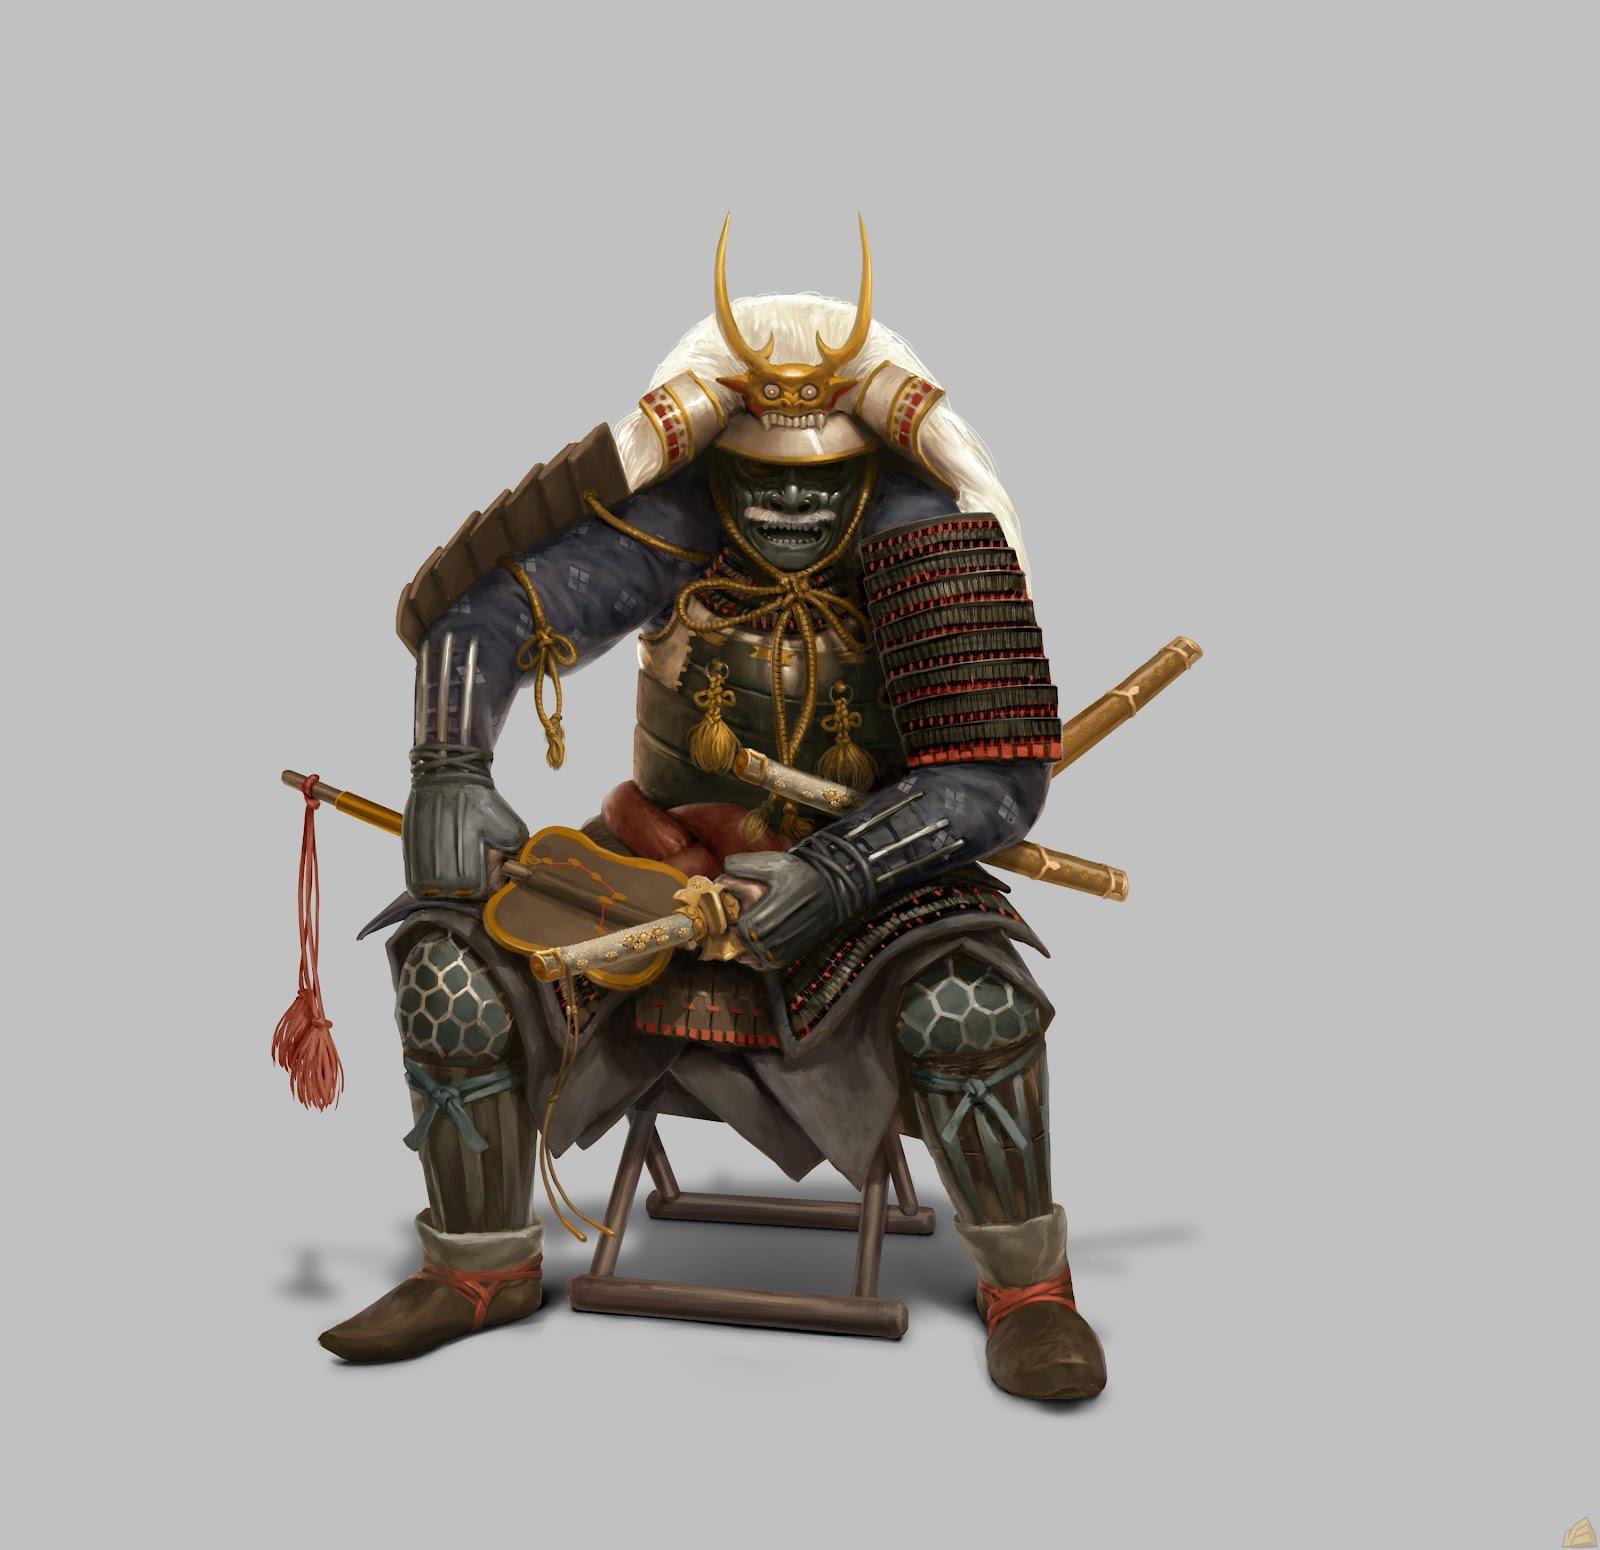 The Way of the Warrior (Bushido)